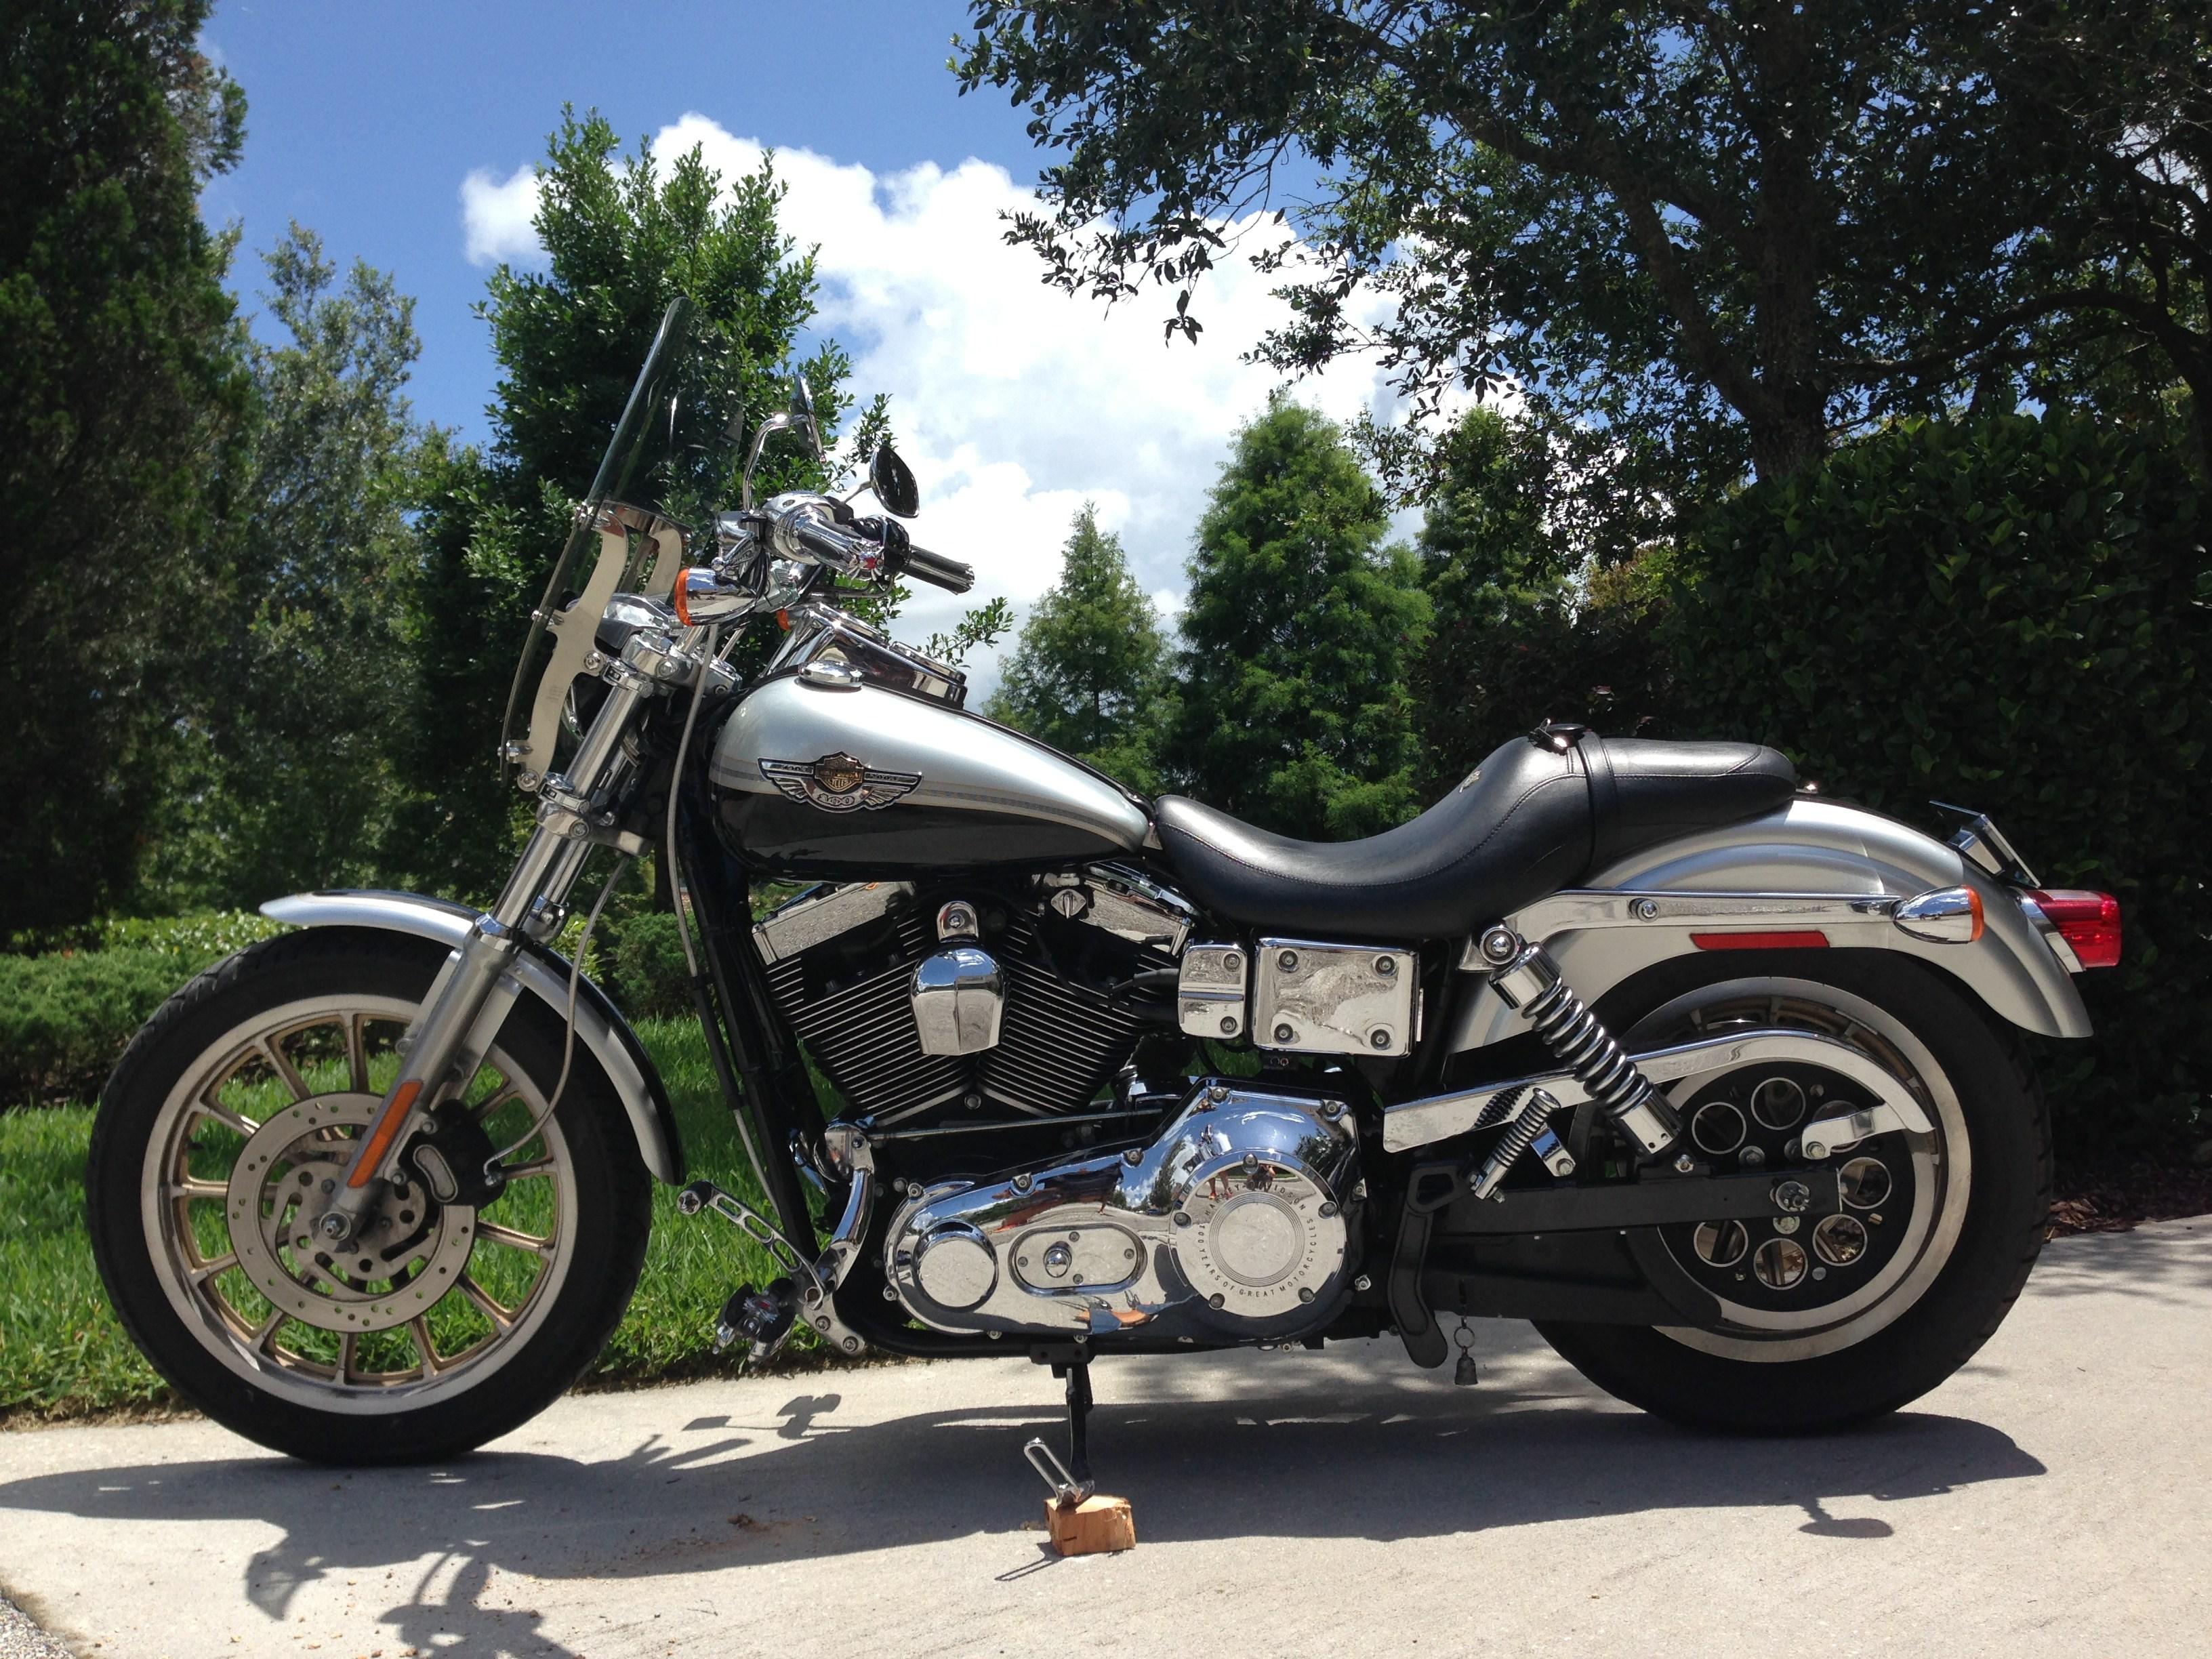 Used Motorcycles Nj >> 2003 Harley-Davidson® FXDL Dyna® Low Rider® (black, silver, chrome), Davenport, Florida (379189 ...